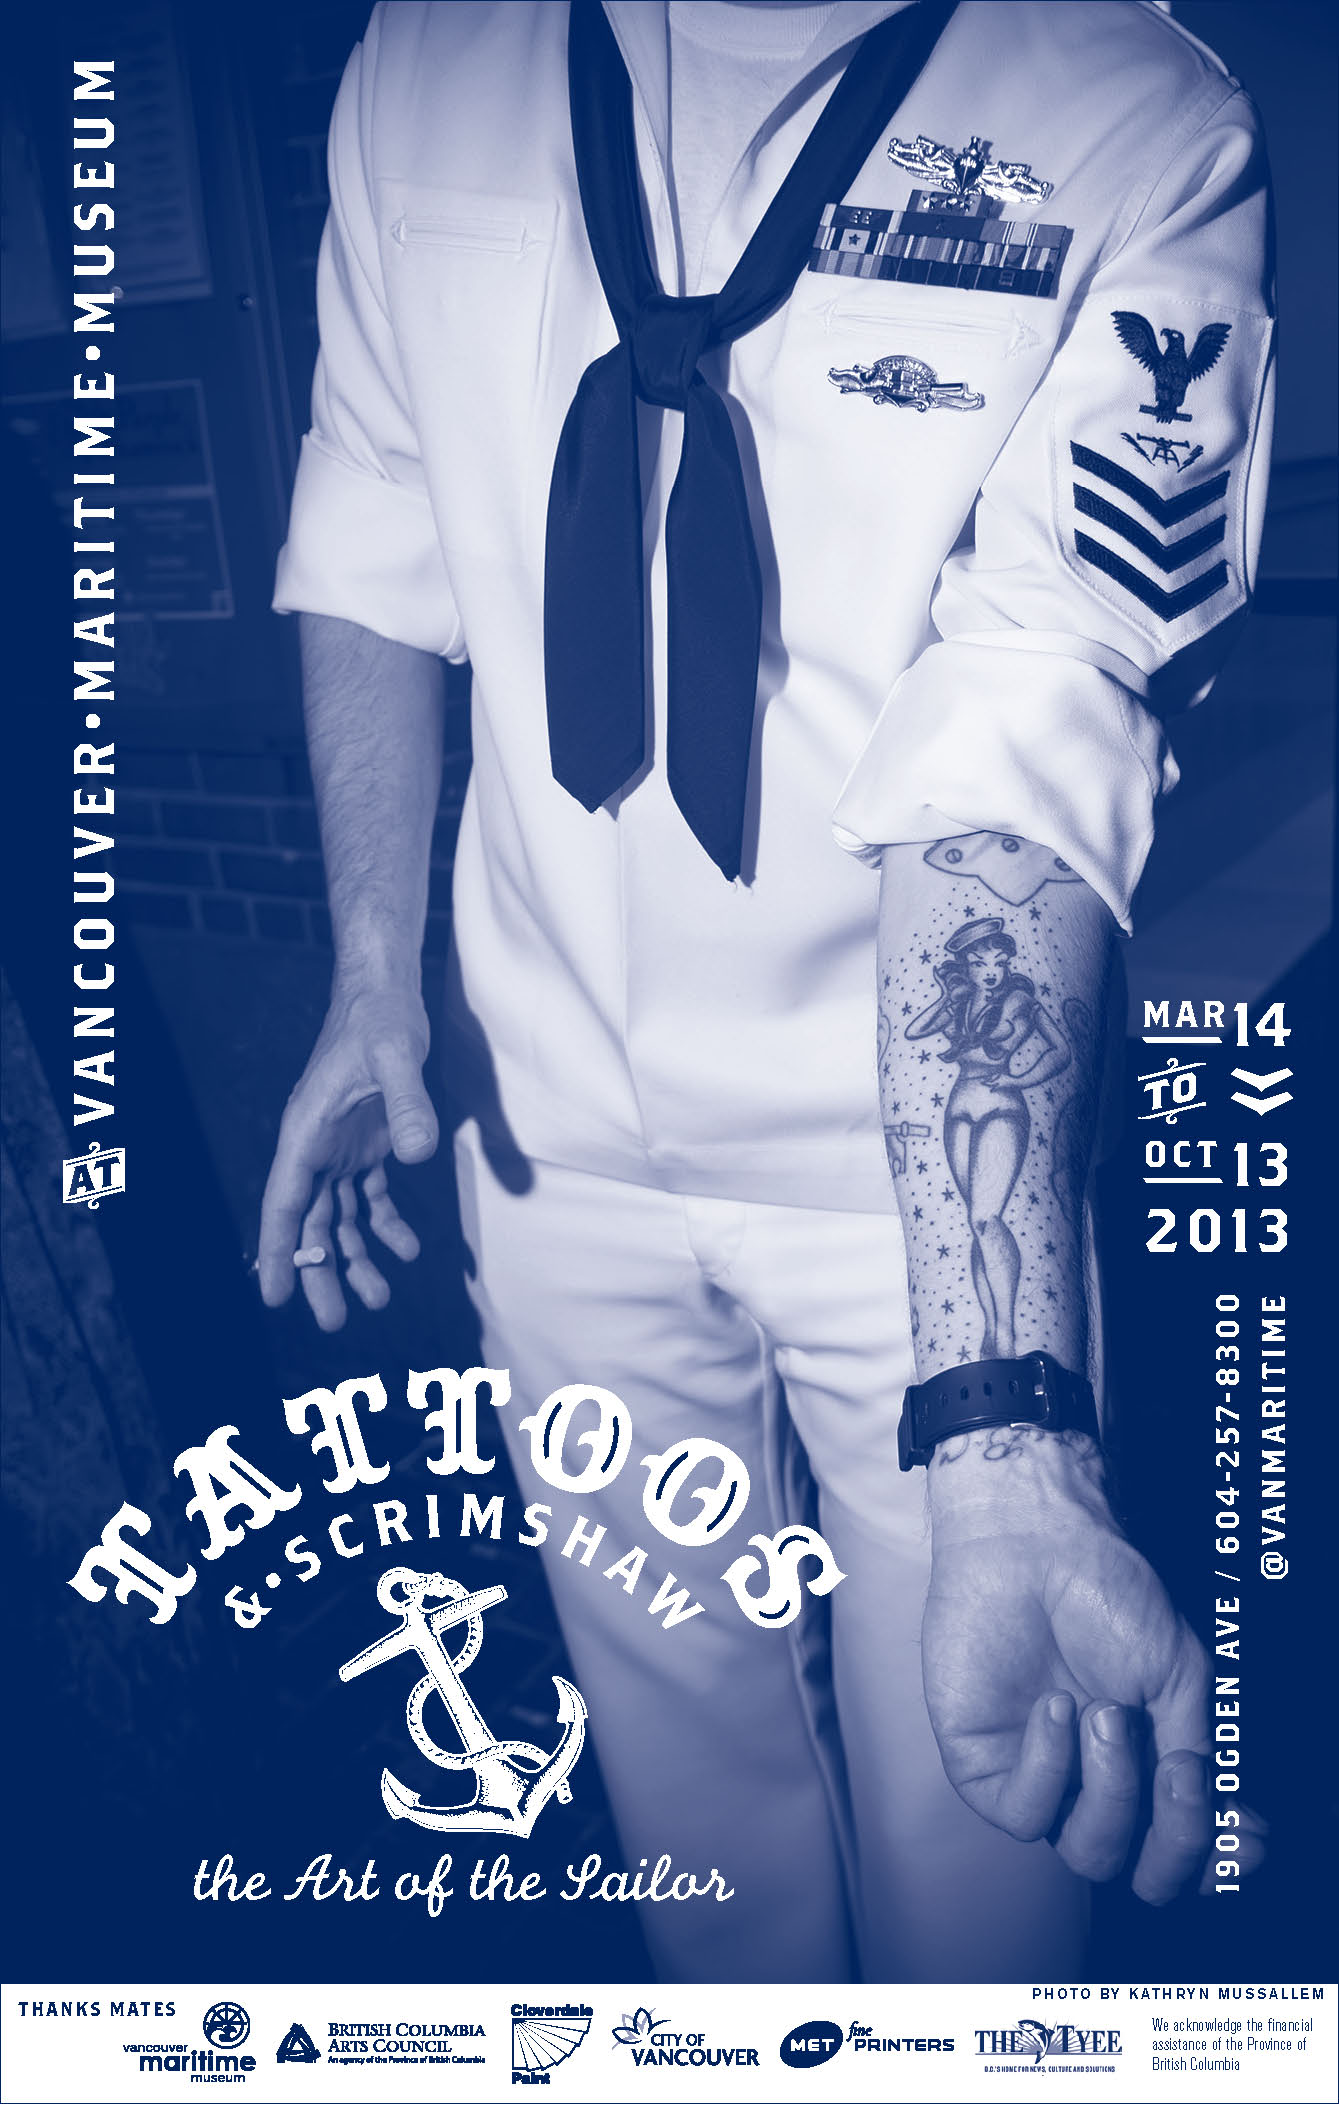 Tattoos & Scrimshaw